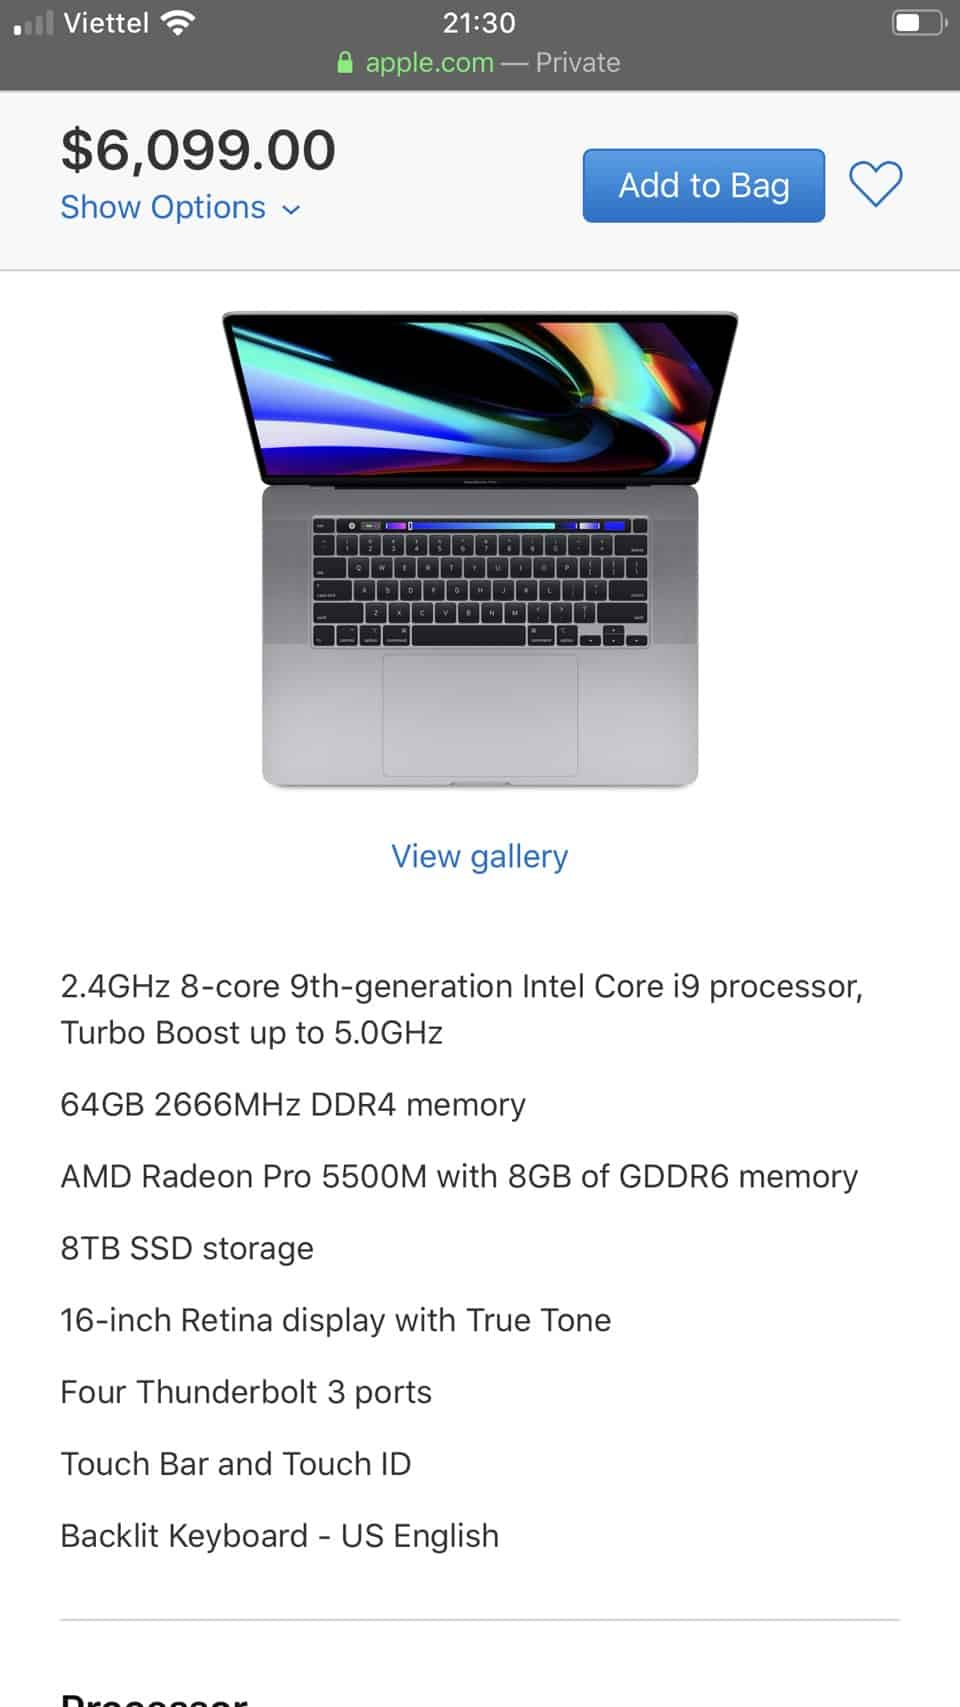 Giá Bán MacBook Pro 16 inch Max Option